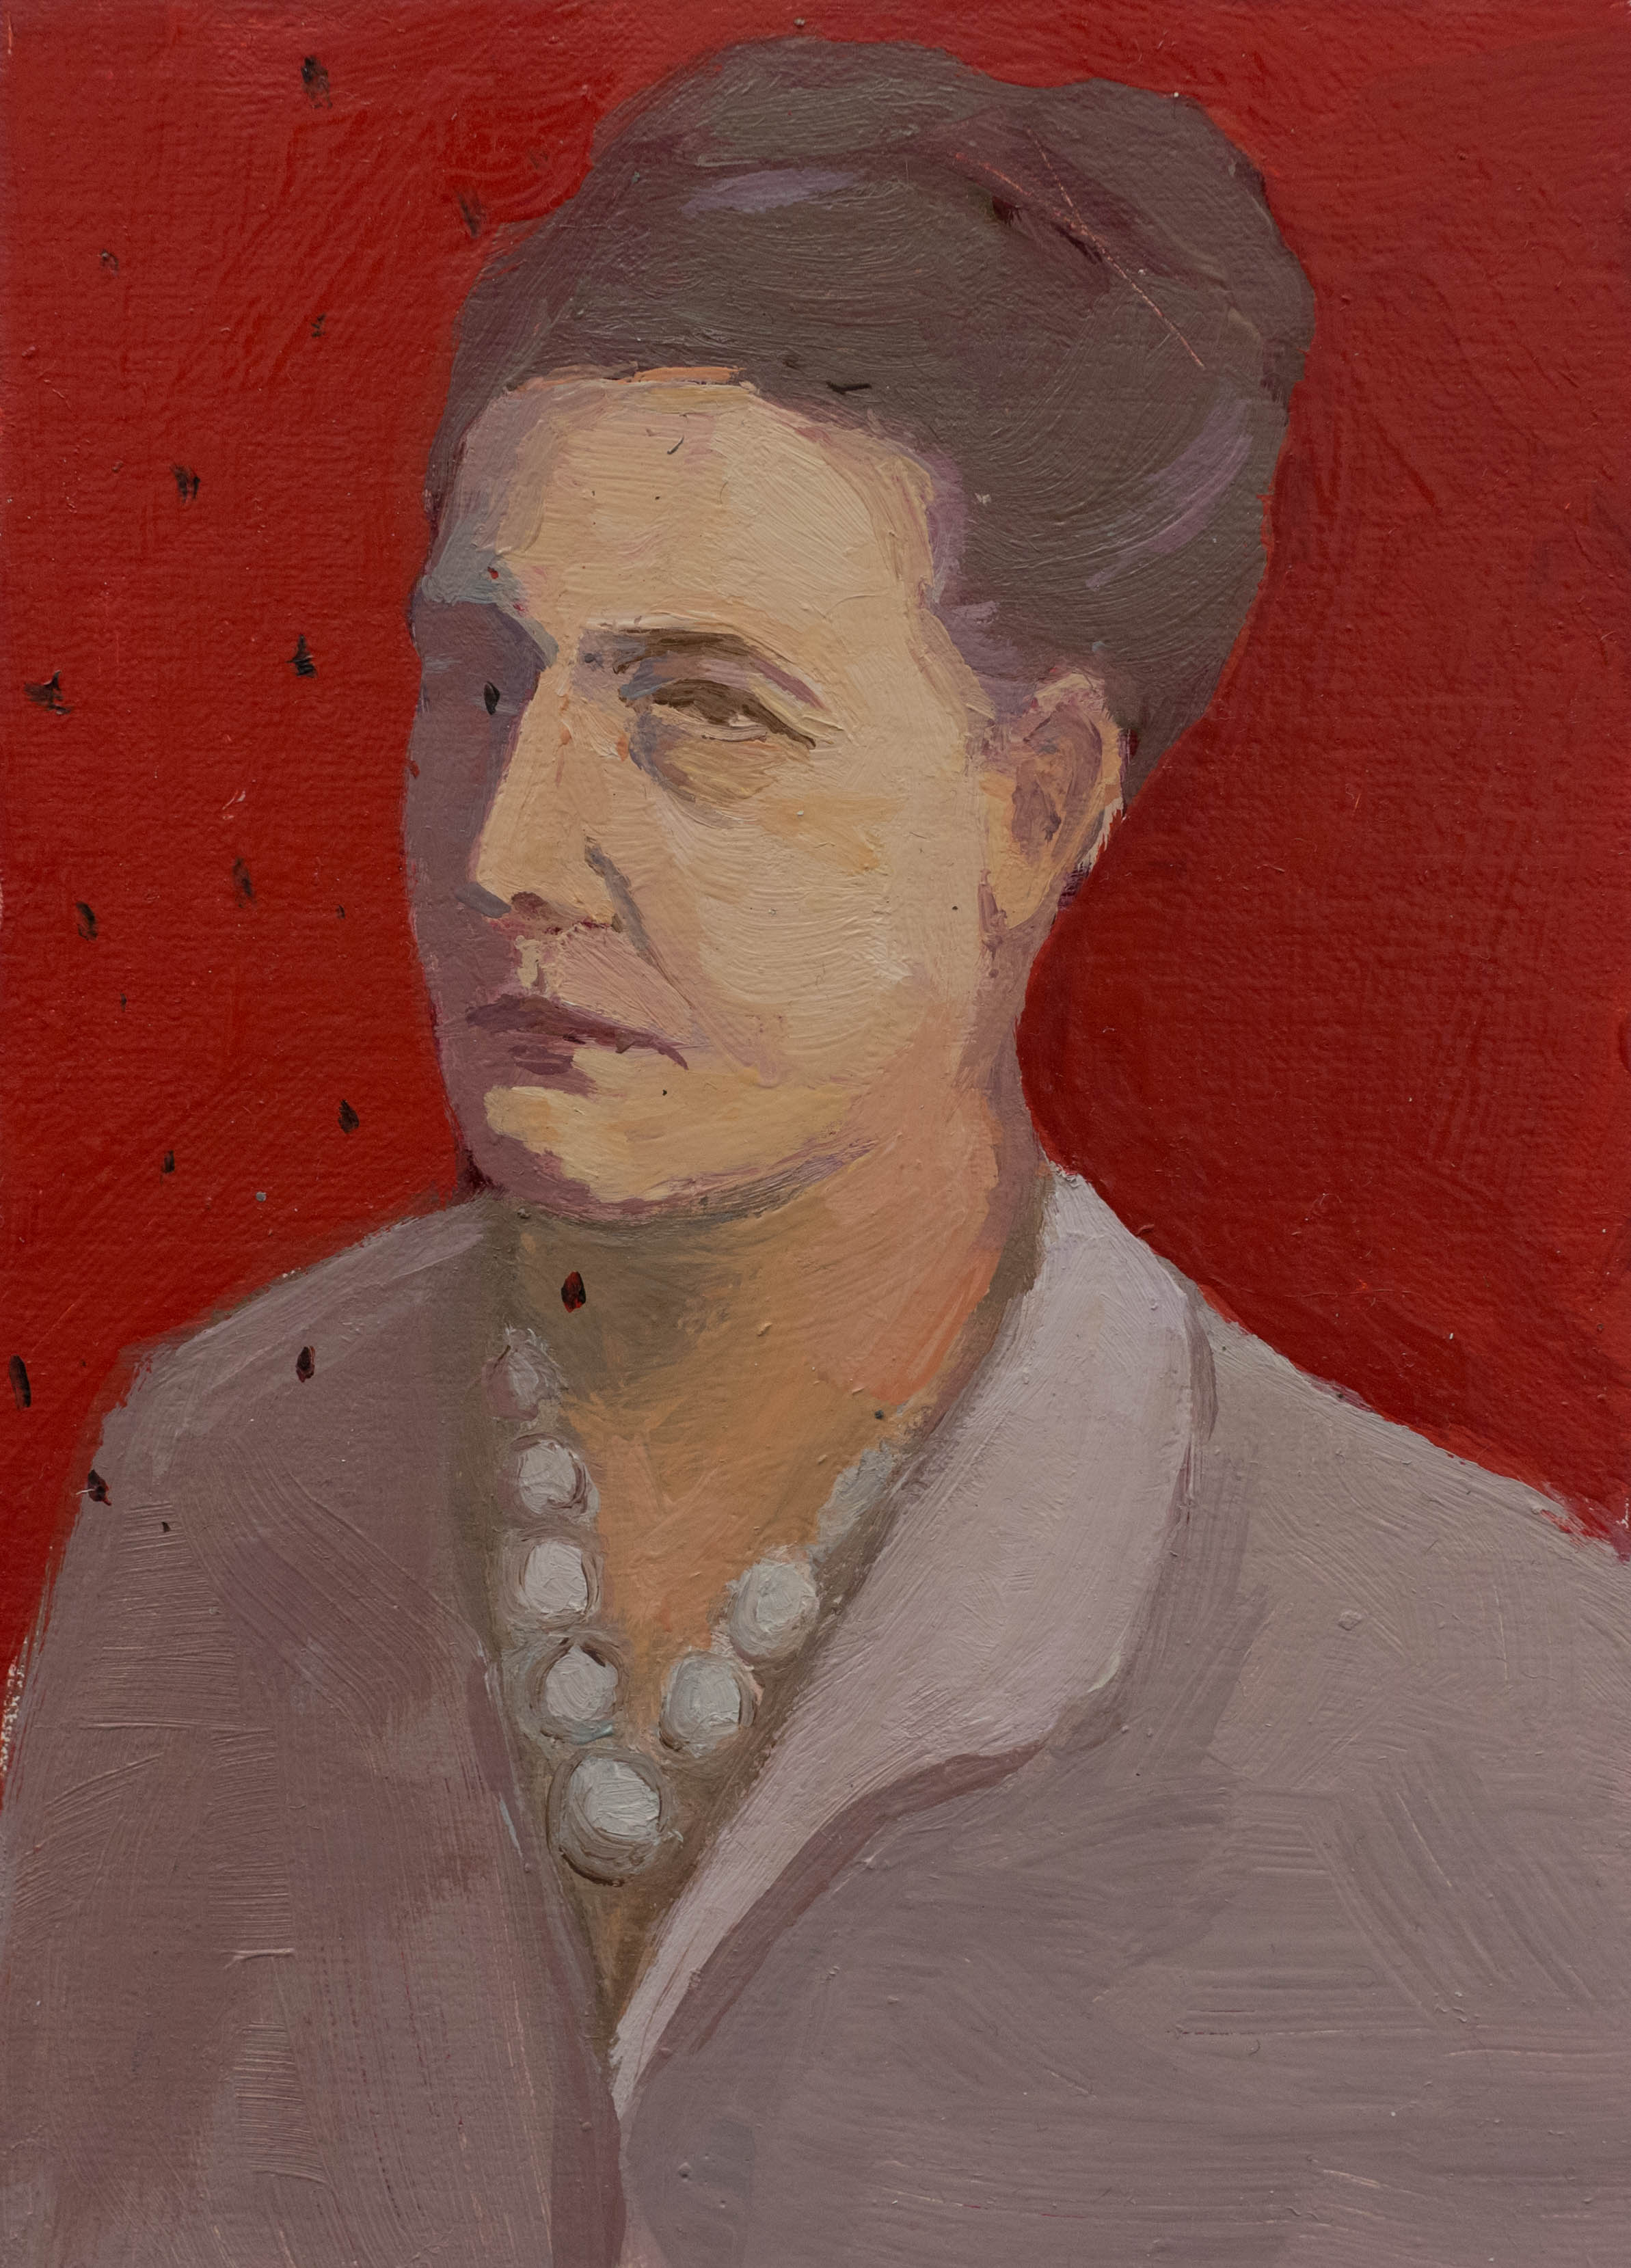 Portrait of Simon De Beauvoir  5 x 7 in  oil on panel